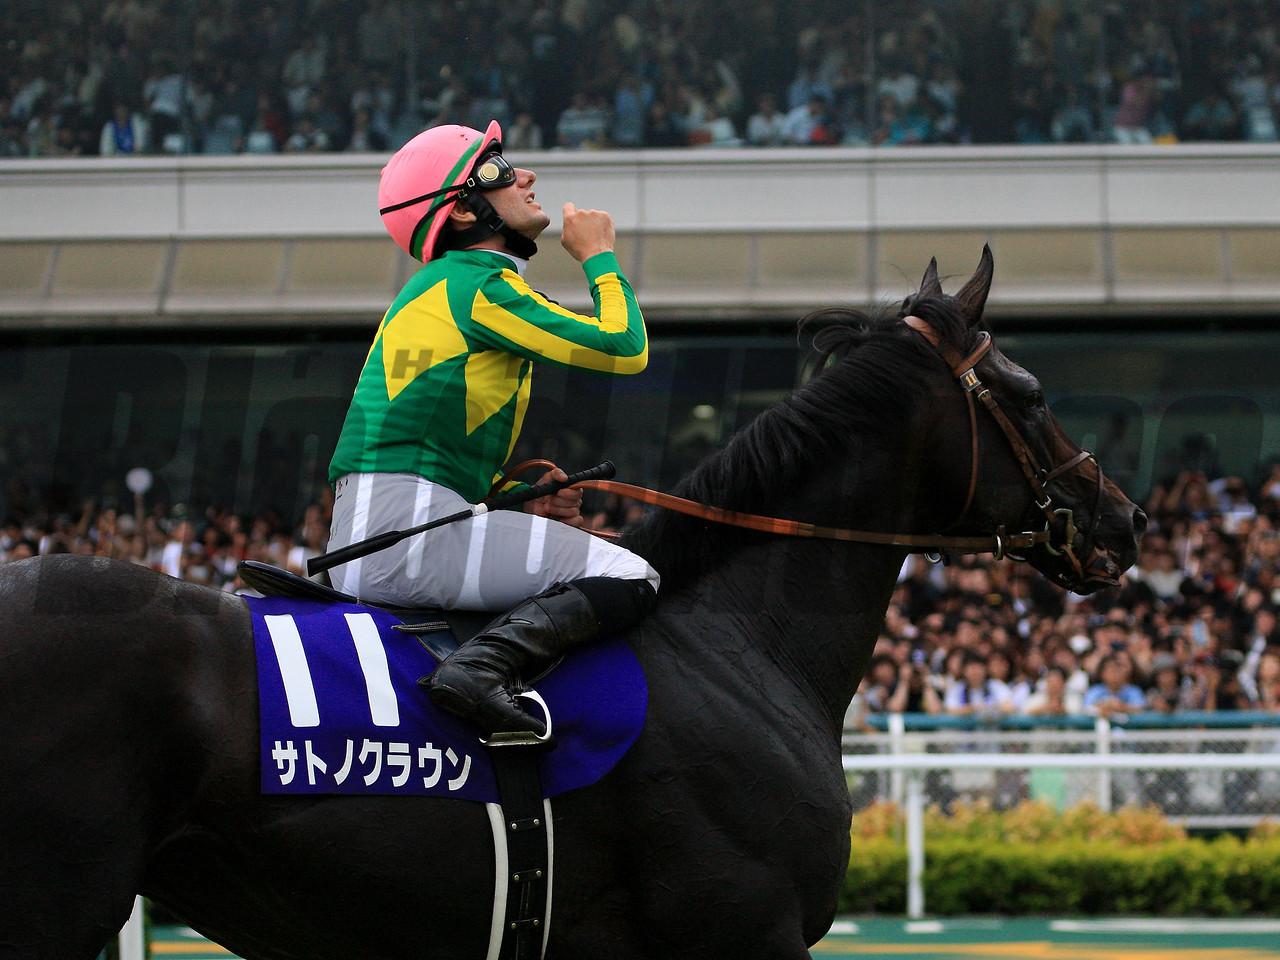 Takarazuka Kinen (G1)<br /> <br /> Winner:Satono Crown (JPN)<br /> <br /> Date:Sunday, 25 June  2017<br /> <br /> Distance:2200m,Turf/about 11furlongs<br /> <br /> Racecourse:Hanshin Racecourse<br /> <br /> Qualification to Run:3yo&up<br />  <br /> Weight:3yo 53Kg/4yo+58Kg<br />  <br /> Allowance:Fillies&Mares/2Kg<br /> Southern Hemisphere Bred Born in 2013/1Kg,2014/3Kg<br />  <br /> Total Value:¥325,000.000 (about US$ 2,826,000)<br /> <br /> Prize Money for the Winner:¥150,000,000 (about US$ 1,304,000)<br /> <br /> Course Condition:Turf Good ,Cloudy<br /> <br /> 1st-11.Satono Crown.(JPN)2 :11.4<br /> <br /> 2nd-2.Gold Actor.(JPN)  3/4<br /> <br /> 3rd-8.Mikki Queen. (JPN) 1 1/2<br /> <br /> 4th-6.Sciacchetra(JPN) 1 3/4